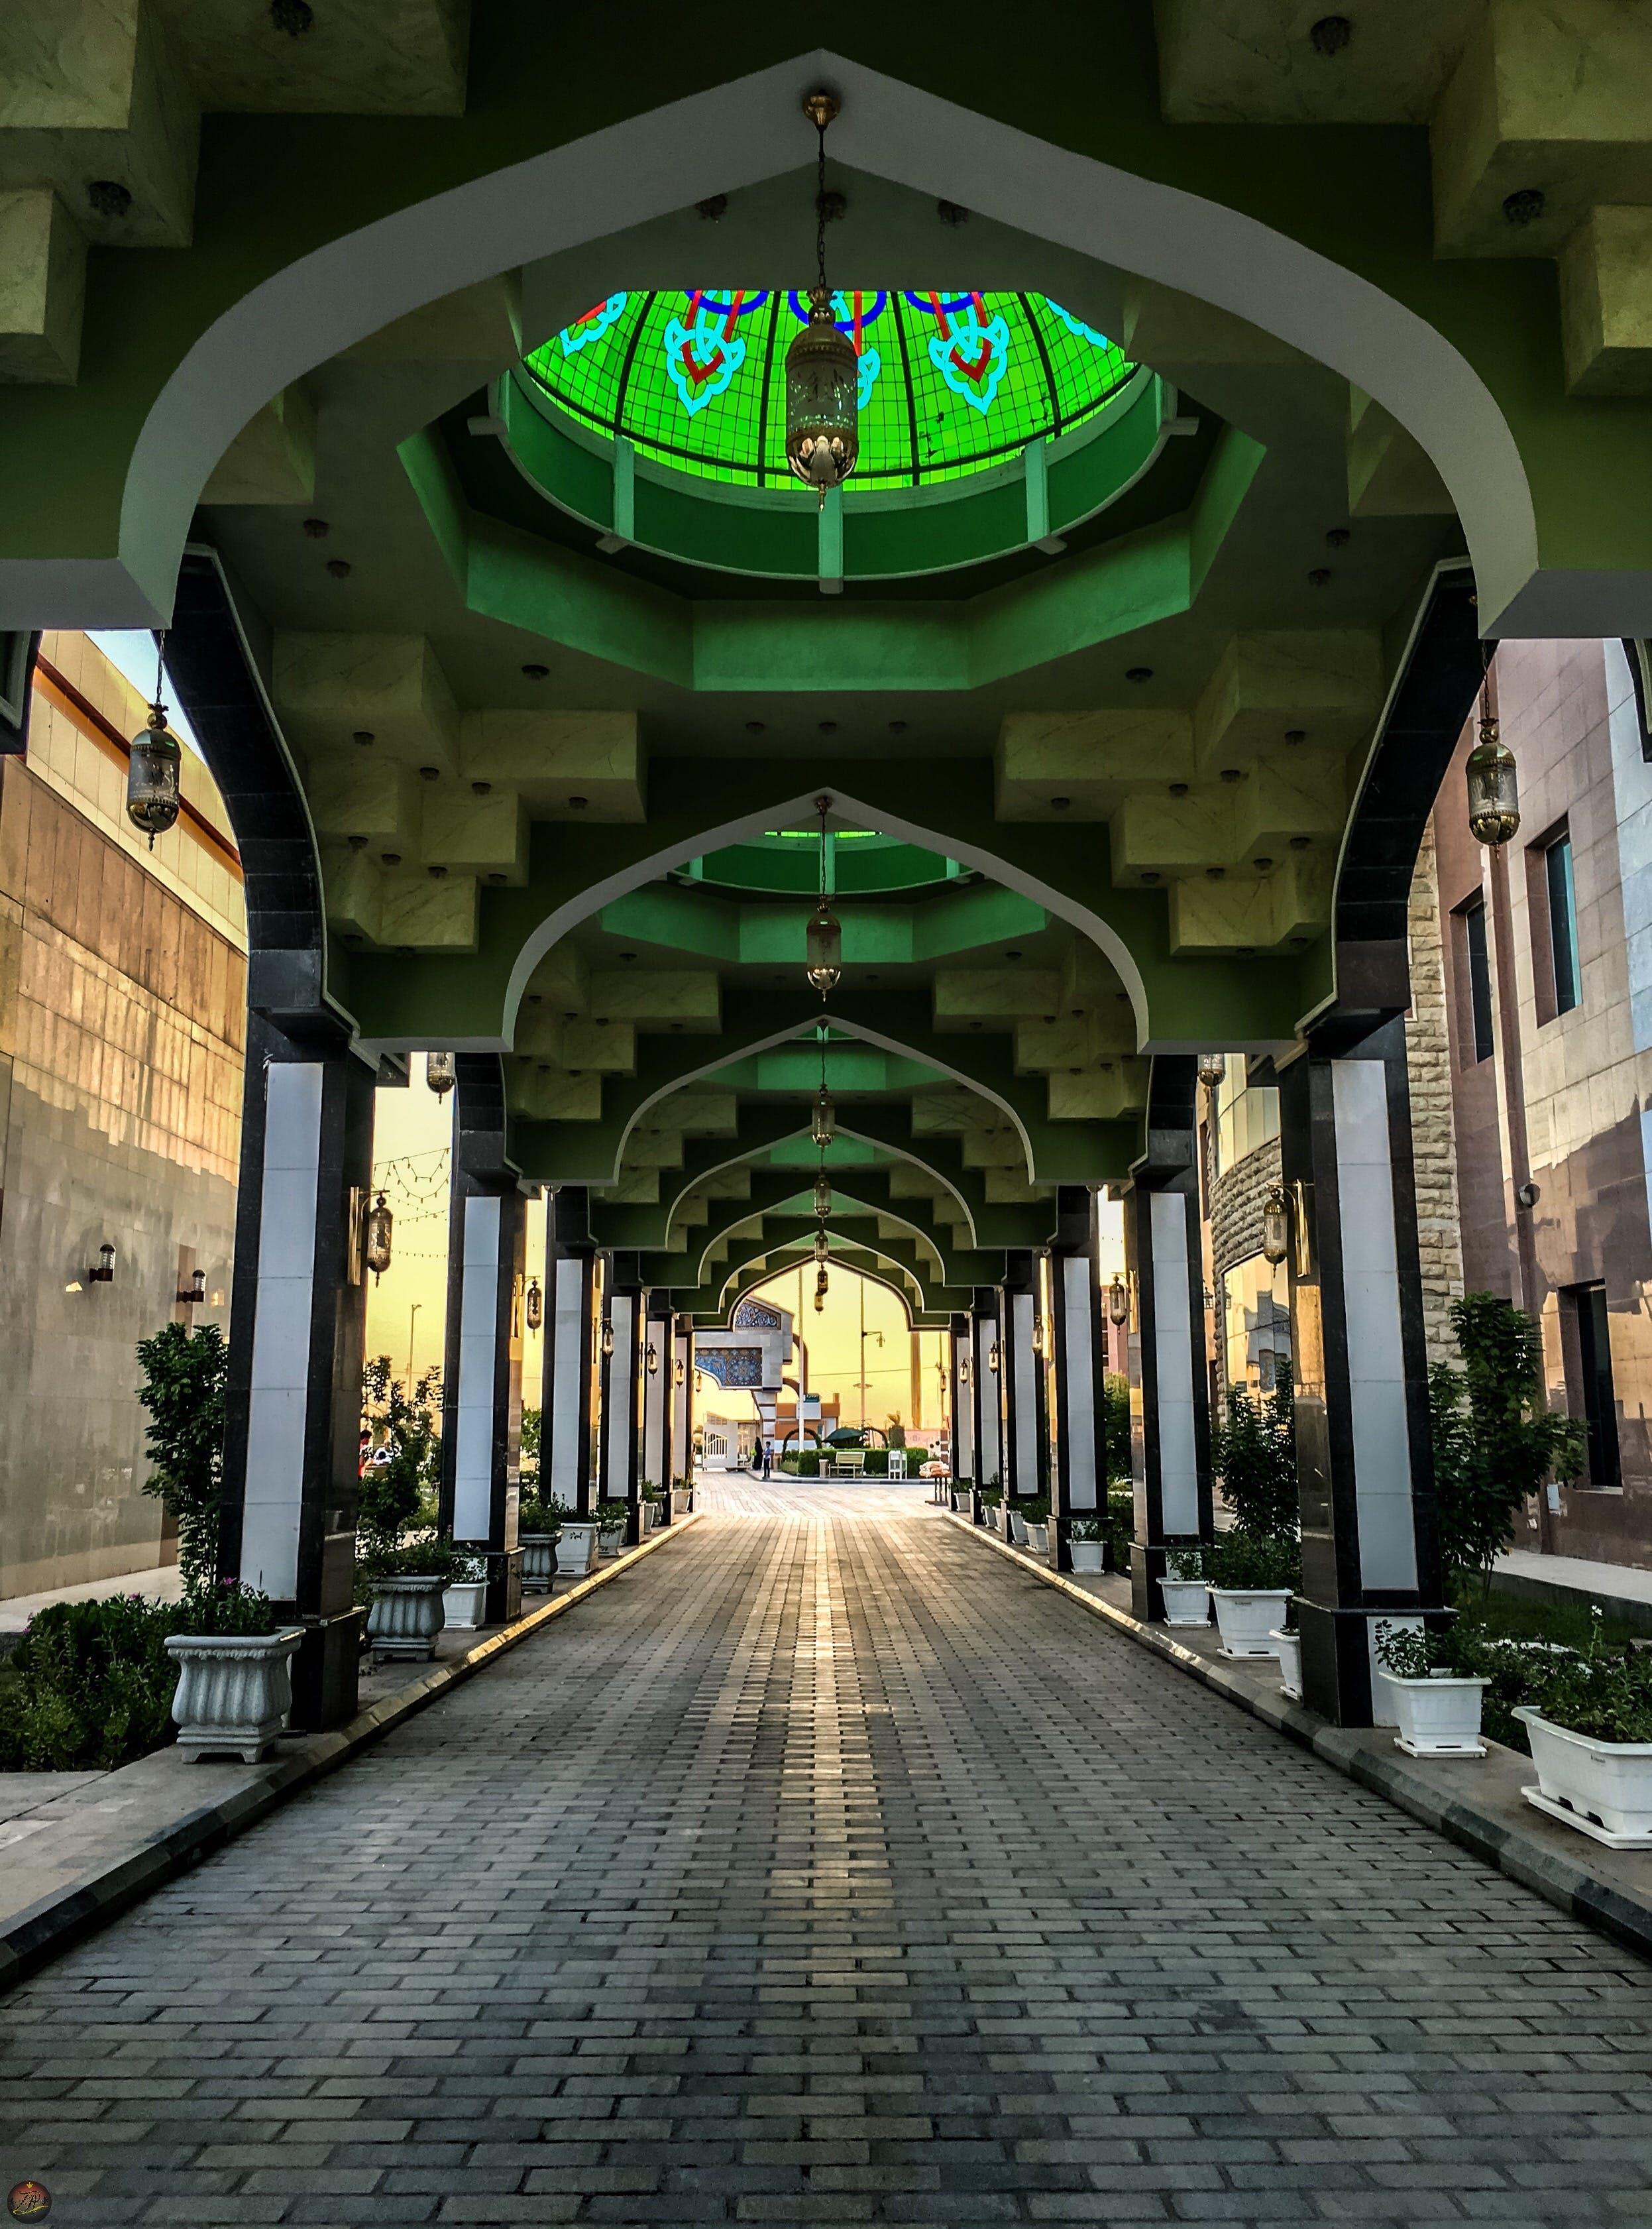 Free stock photo of architecture, culture, dark green, empty street